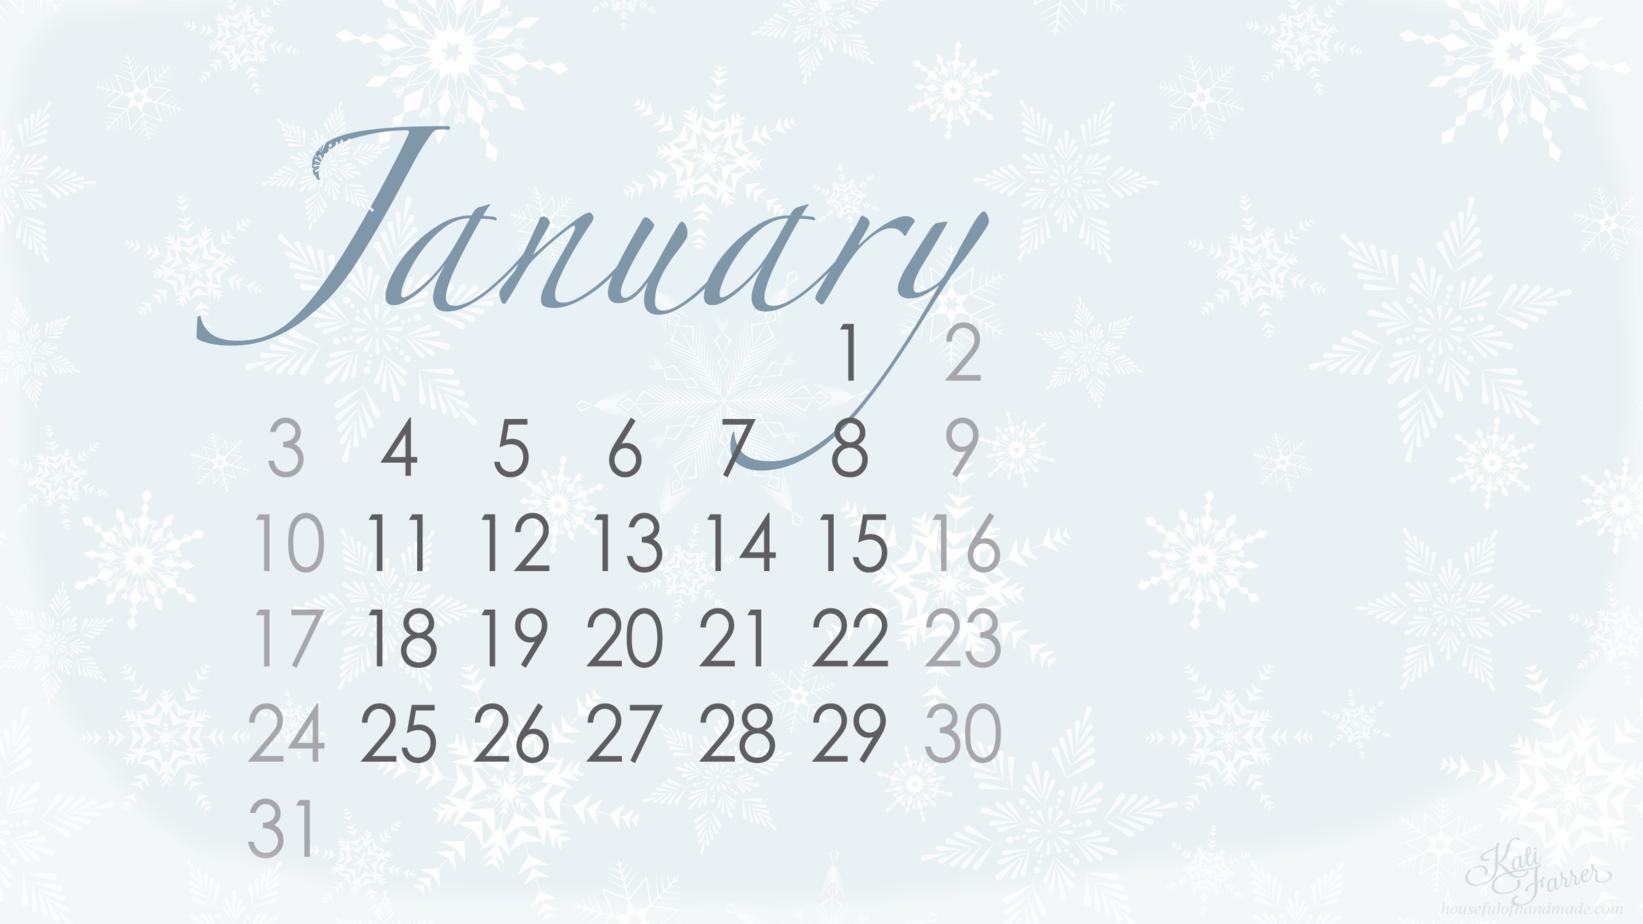 desktop background with calendar